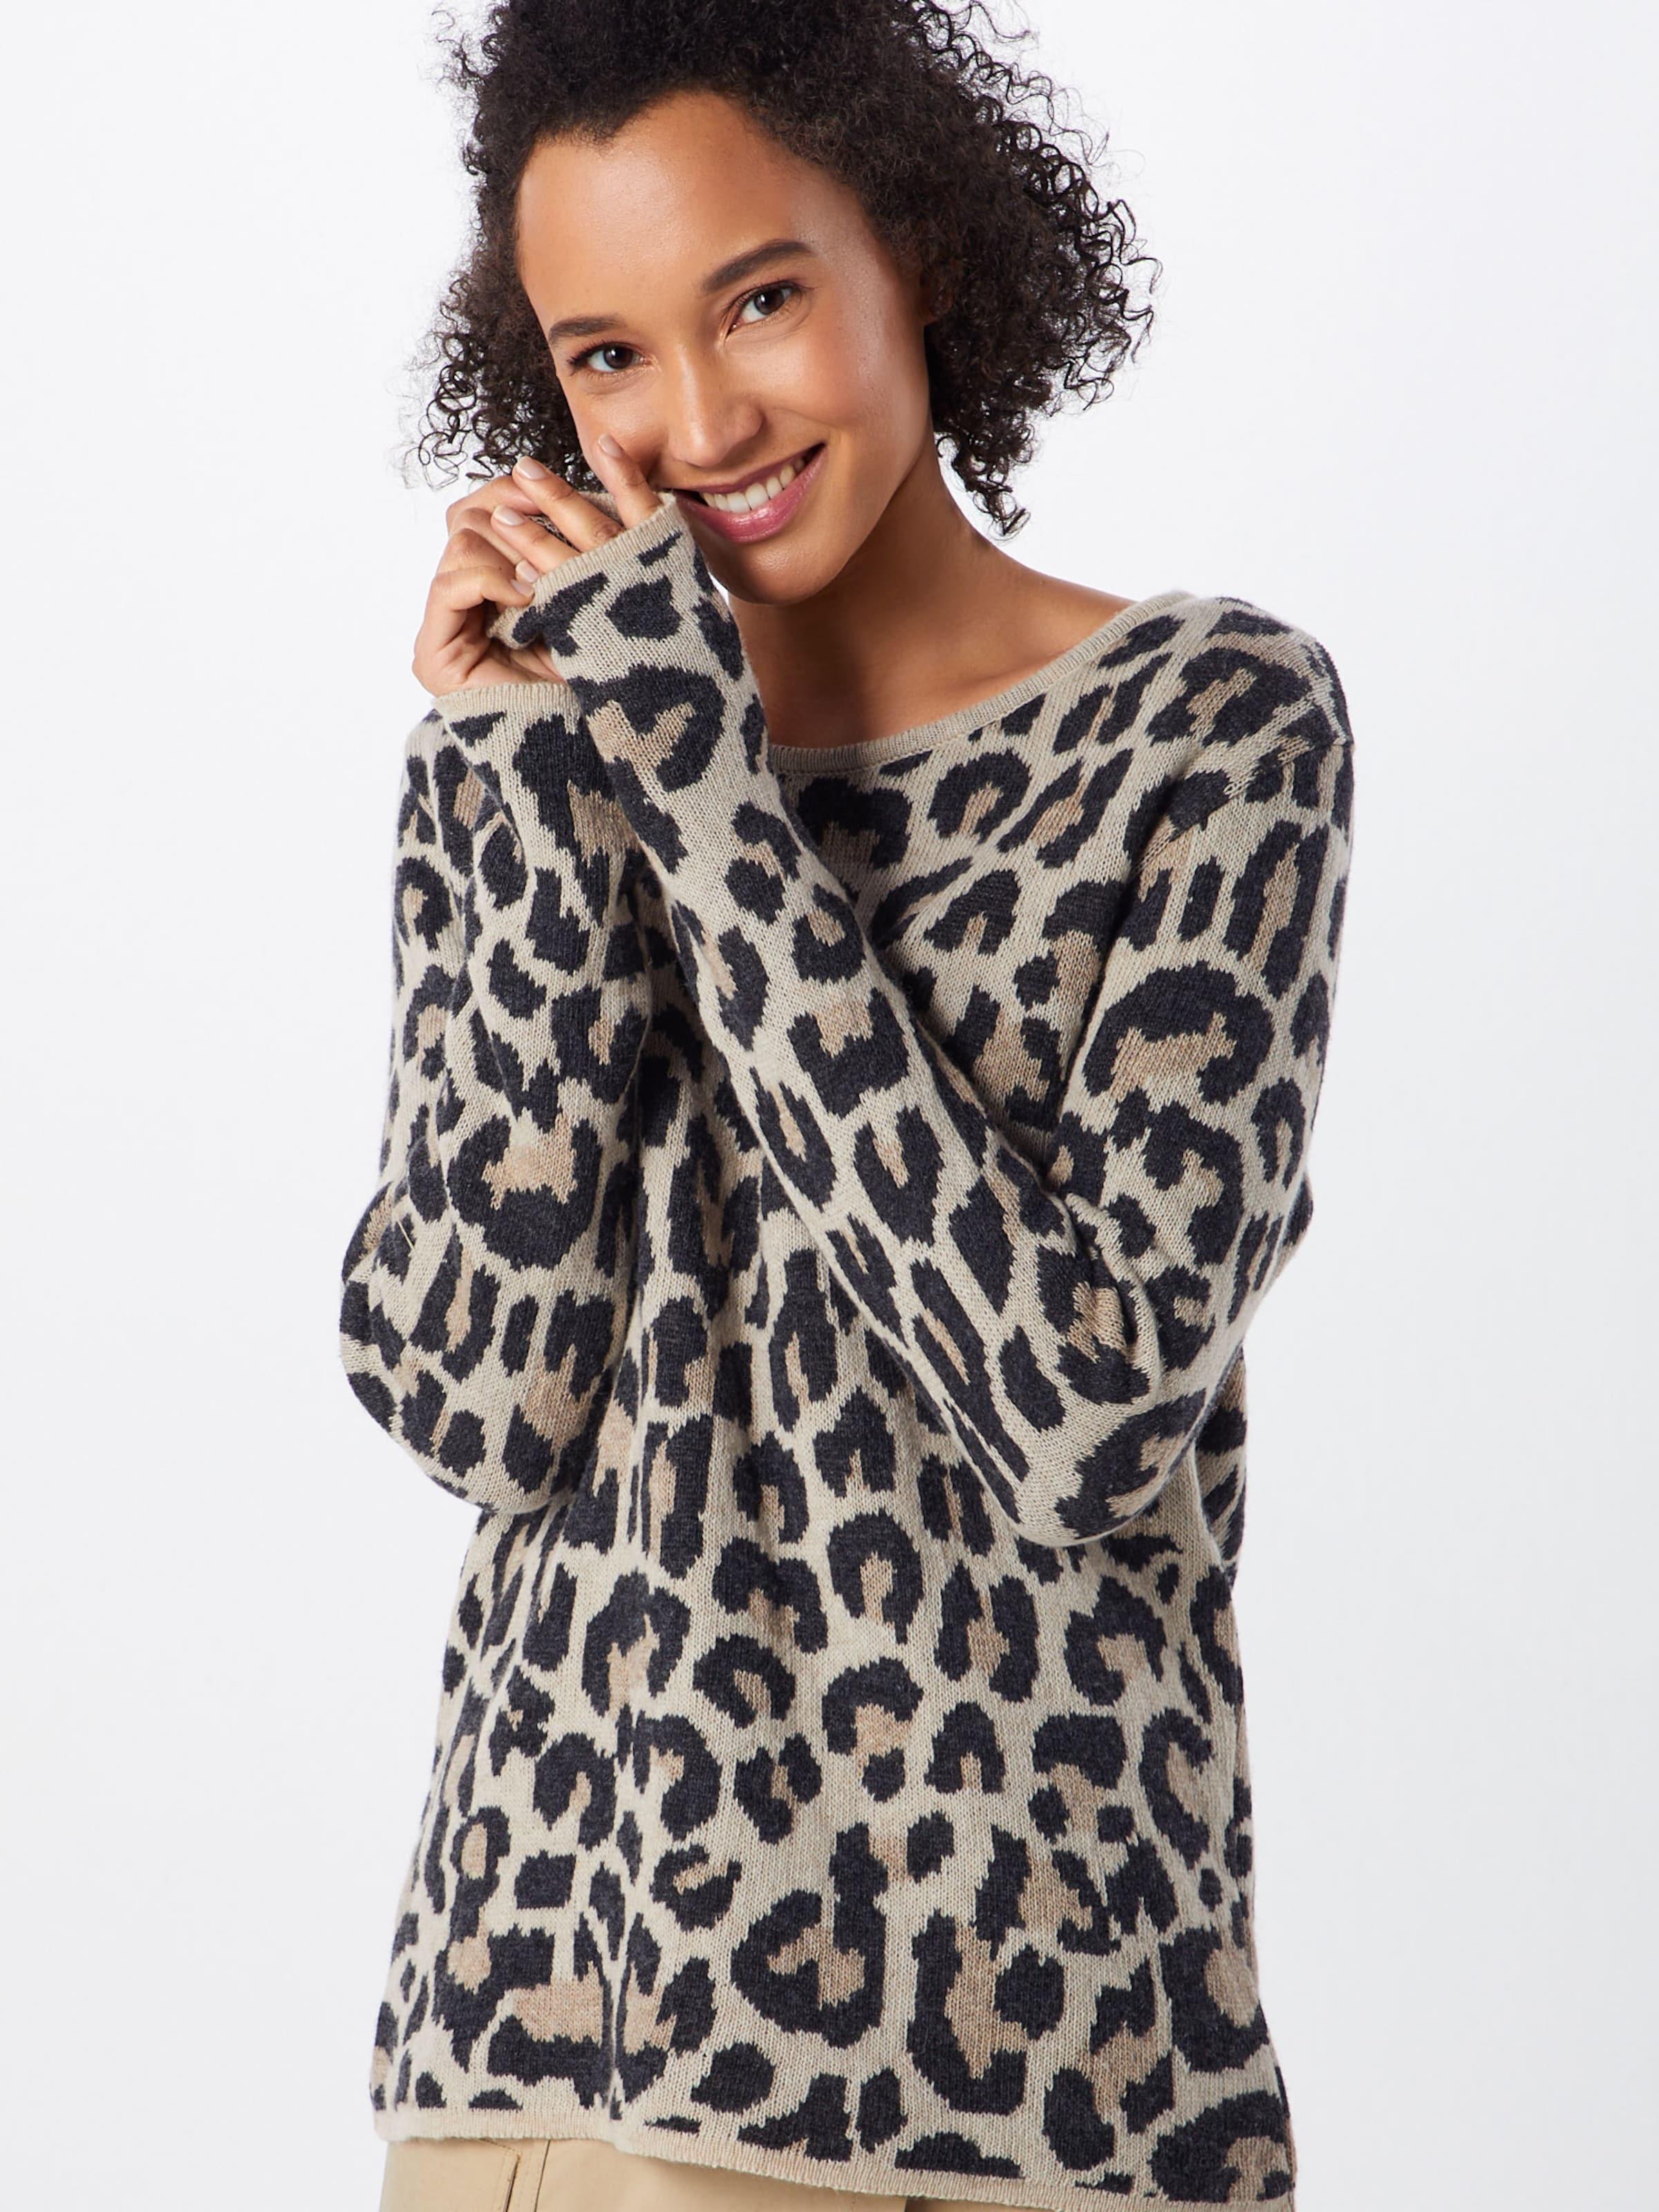 Pullover 'leo' Pullover Zwillingsherz Zwillingsherz 'leo' In HellbraunSchwarz OuwXTZikP